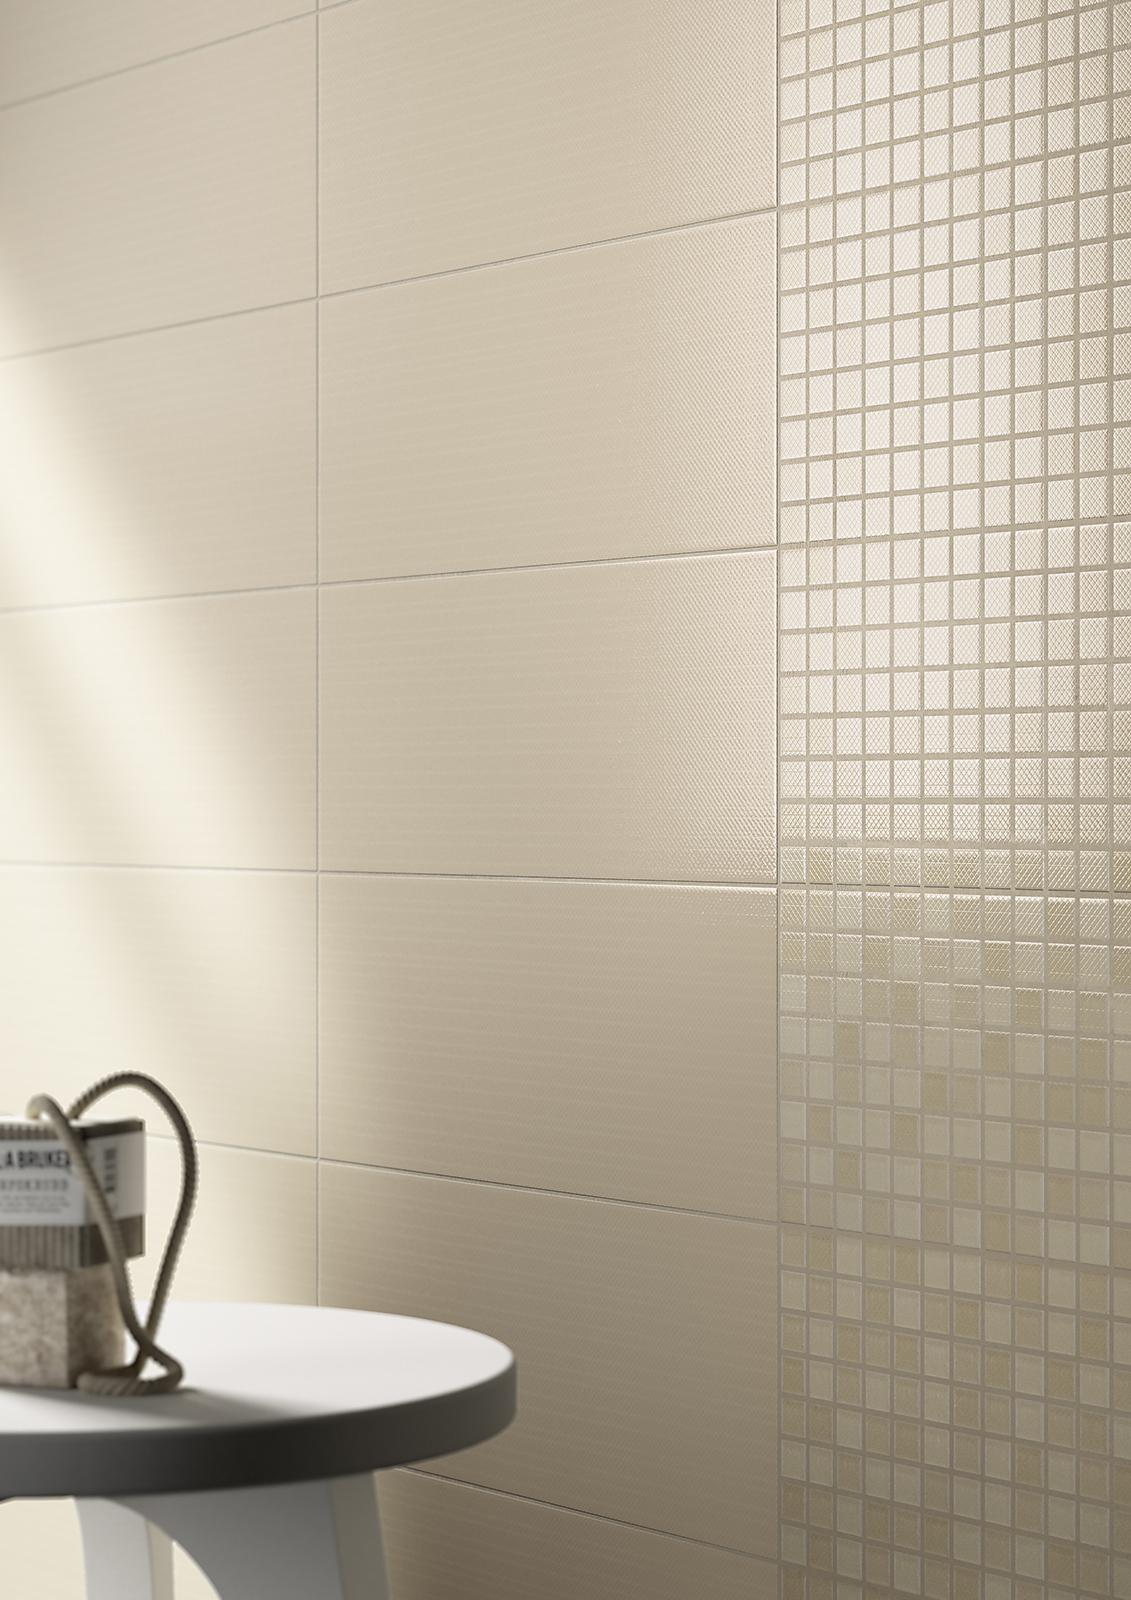 Azulev fossil stone gris porcelain wall amp floor tiles 600x300mm - Shine Ceramic Tiles Marazzi 6189